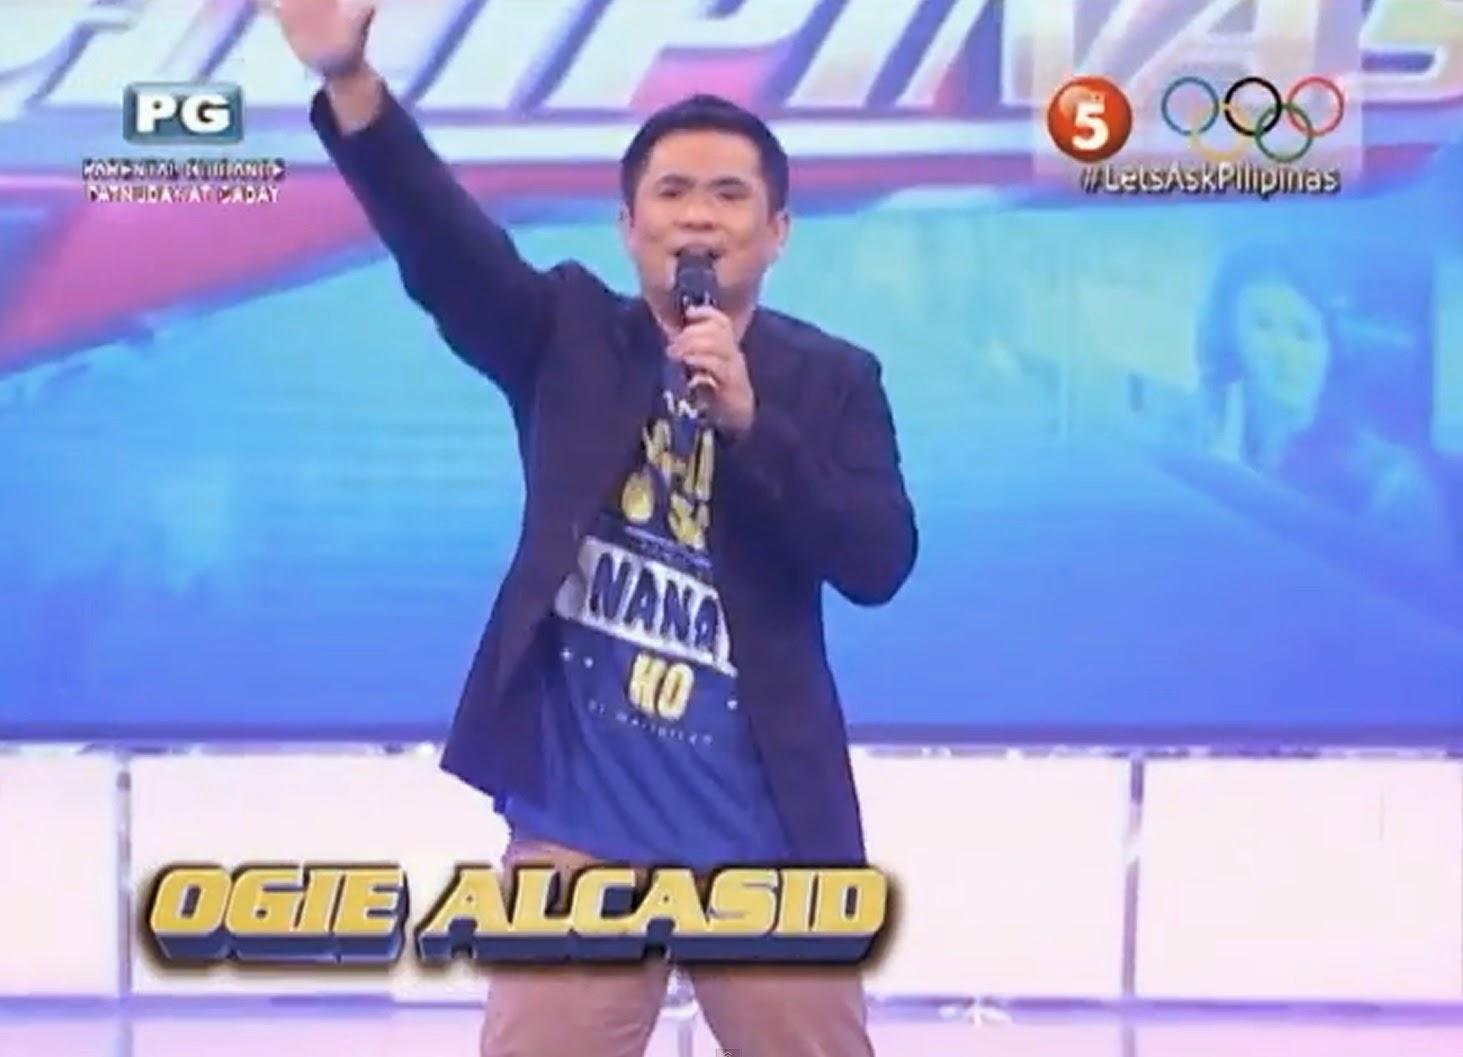 OGIE ALCASID LET'S ASK PILIPINAS